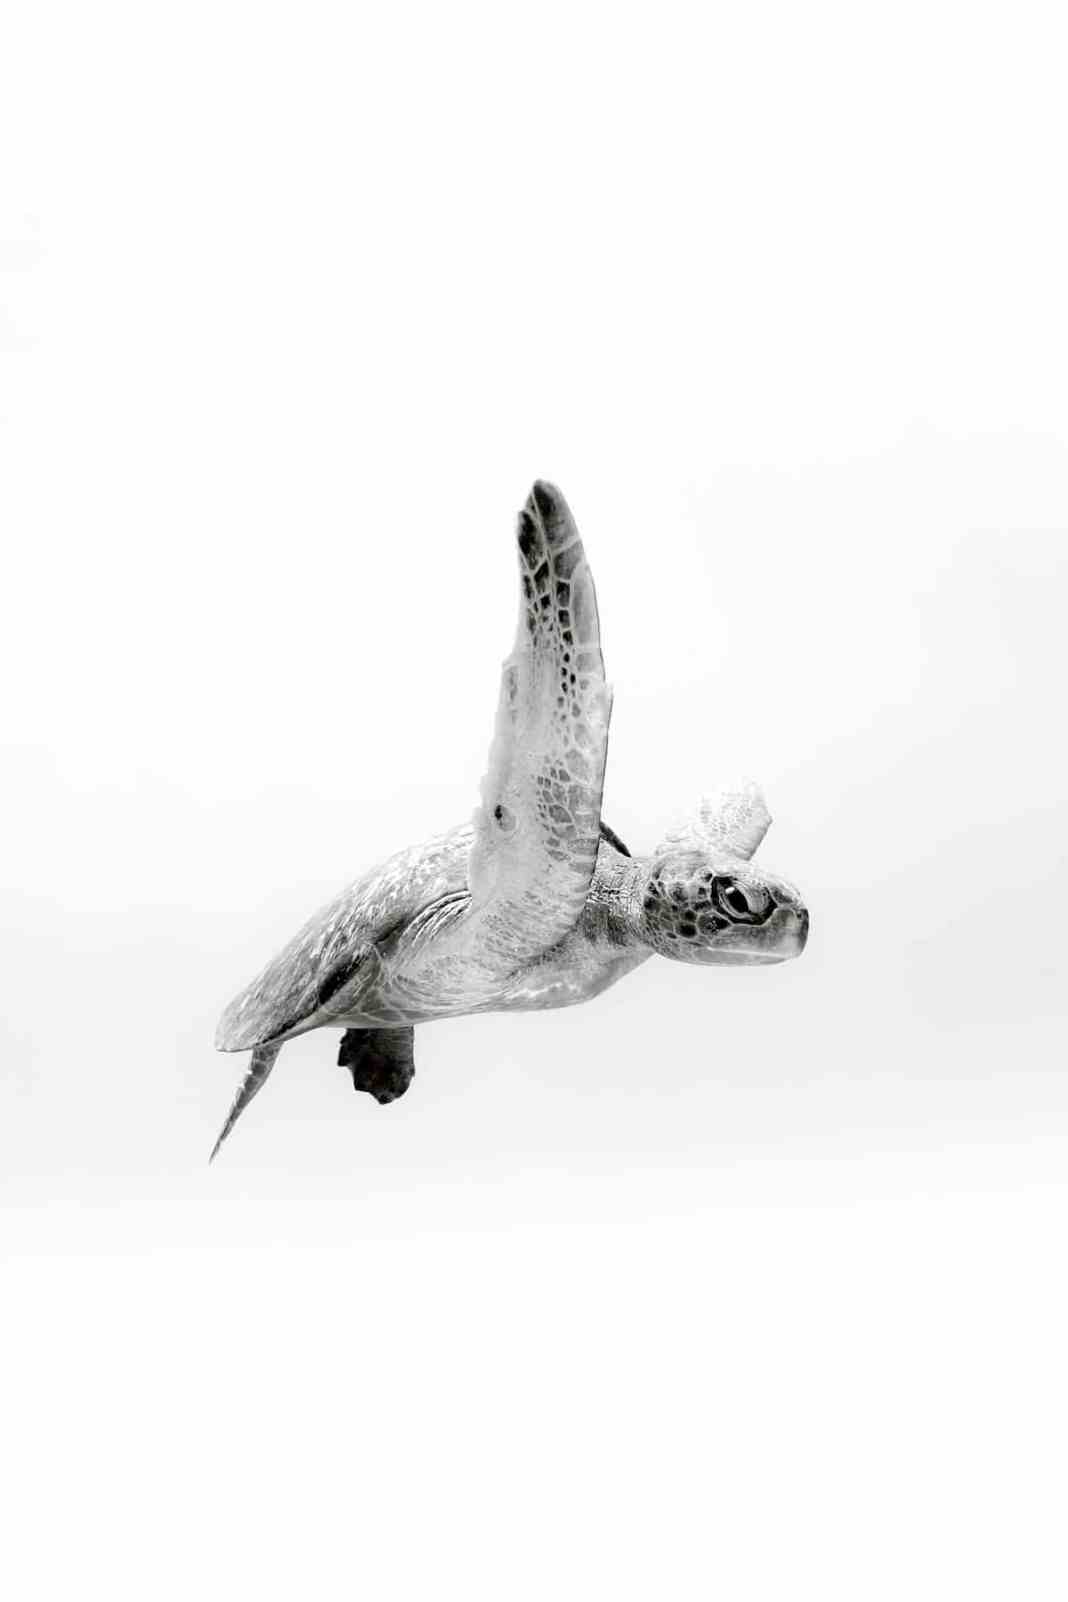 Christian Vizl的海龟